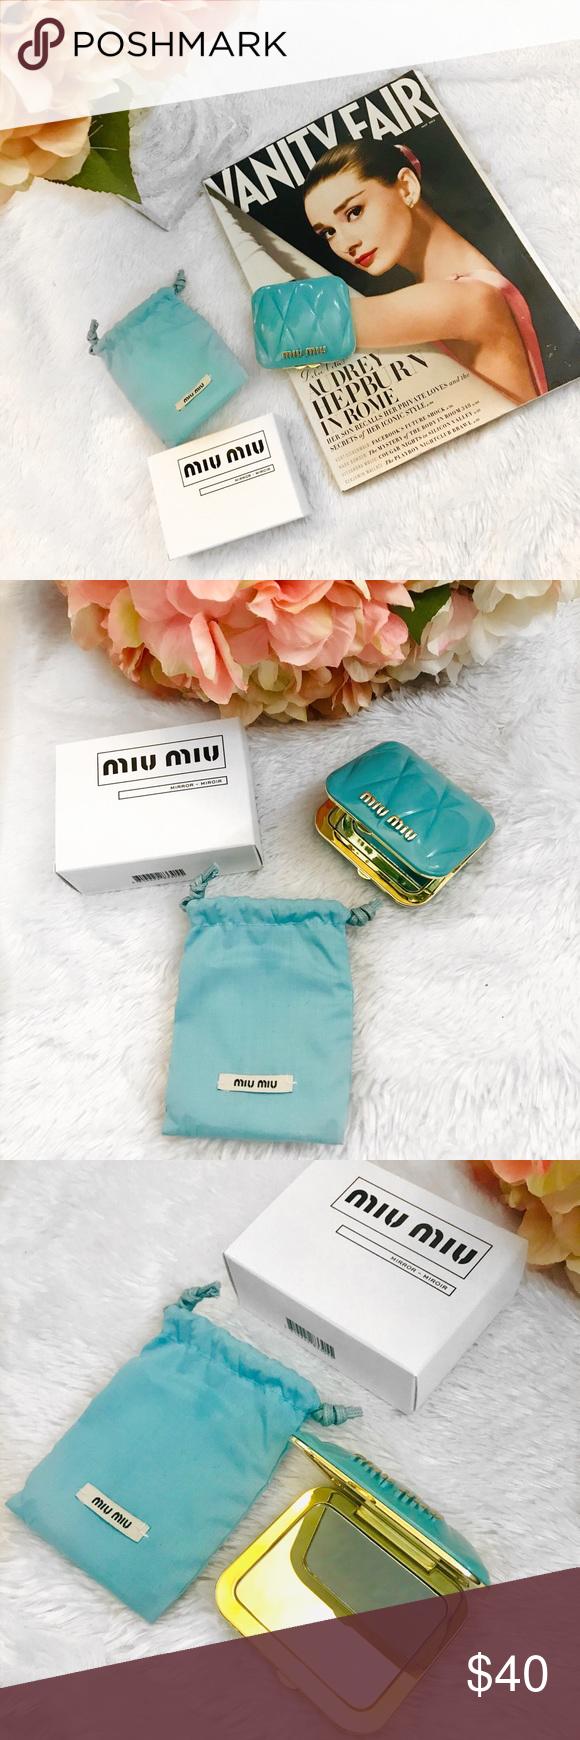 Miu Miu Compact Pocket Mirror GWP Pocket mirror, Tiffany